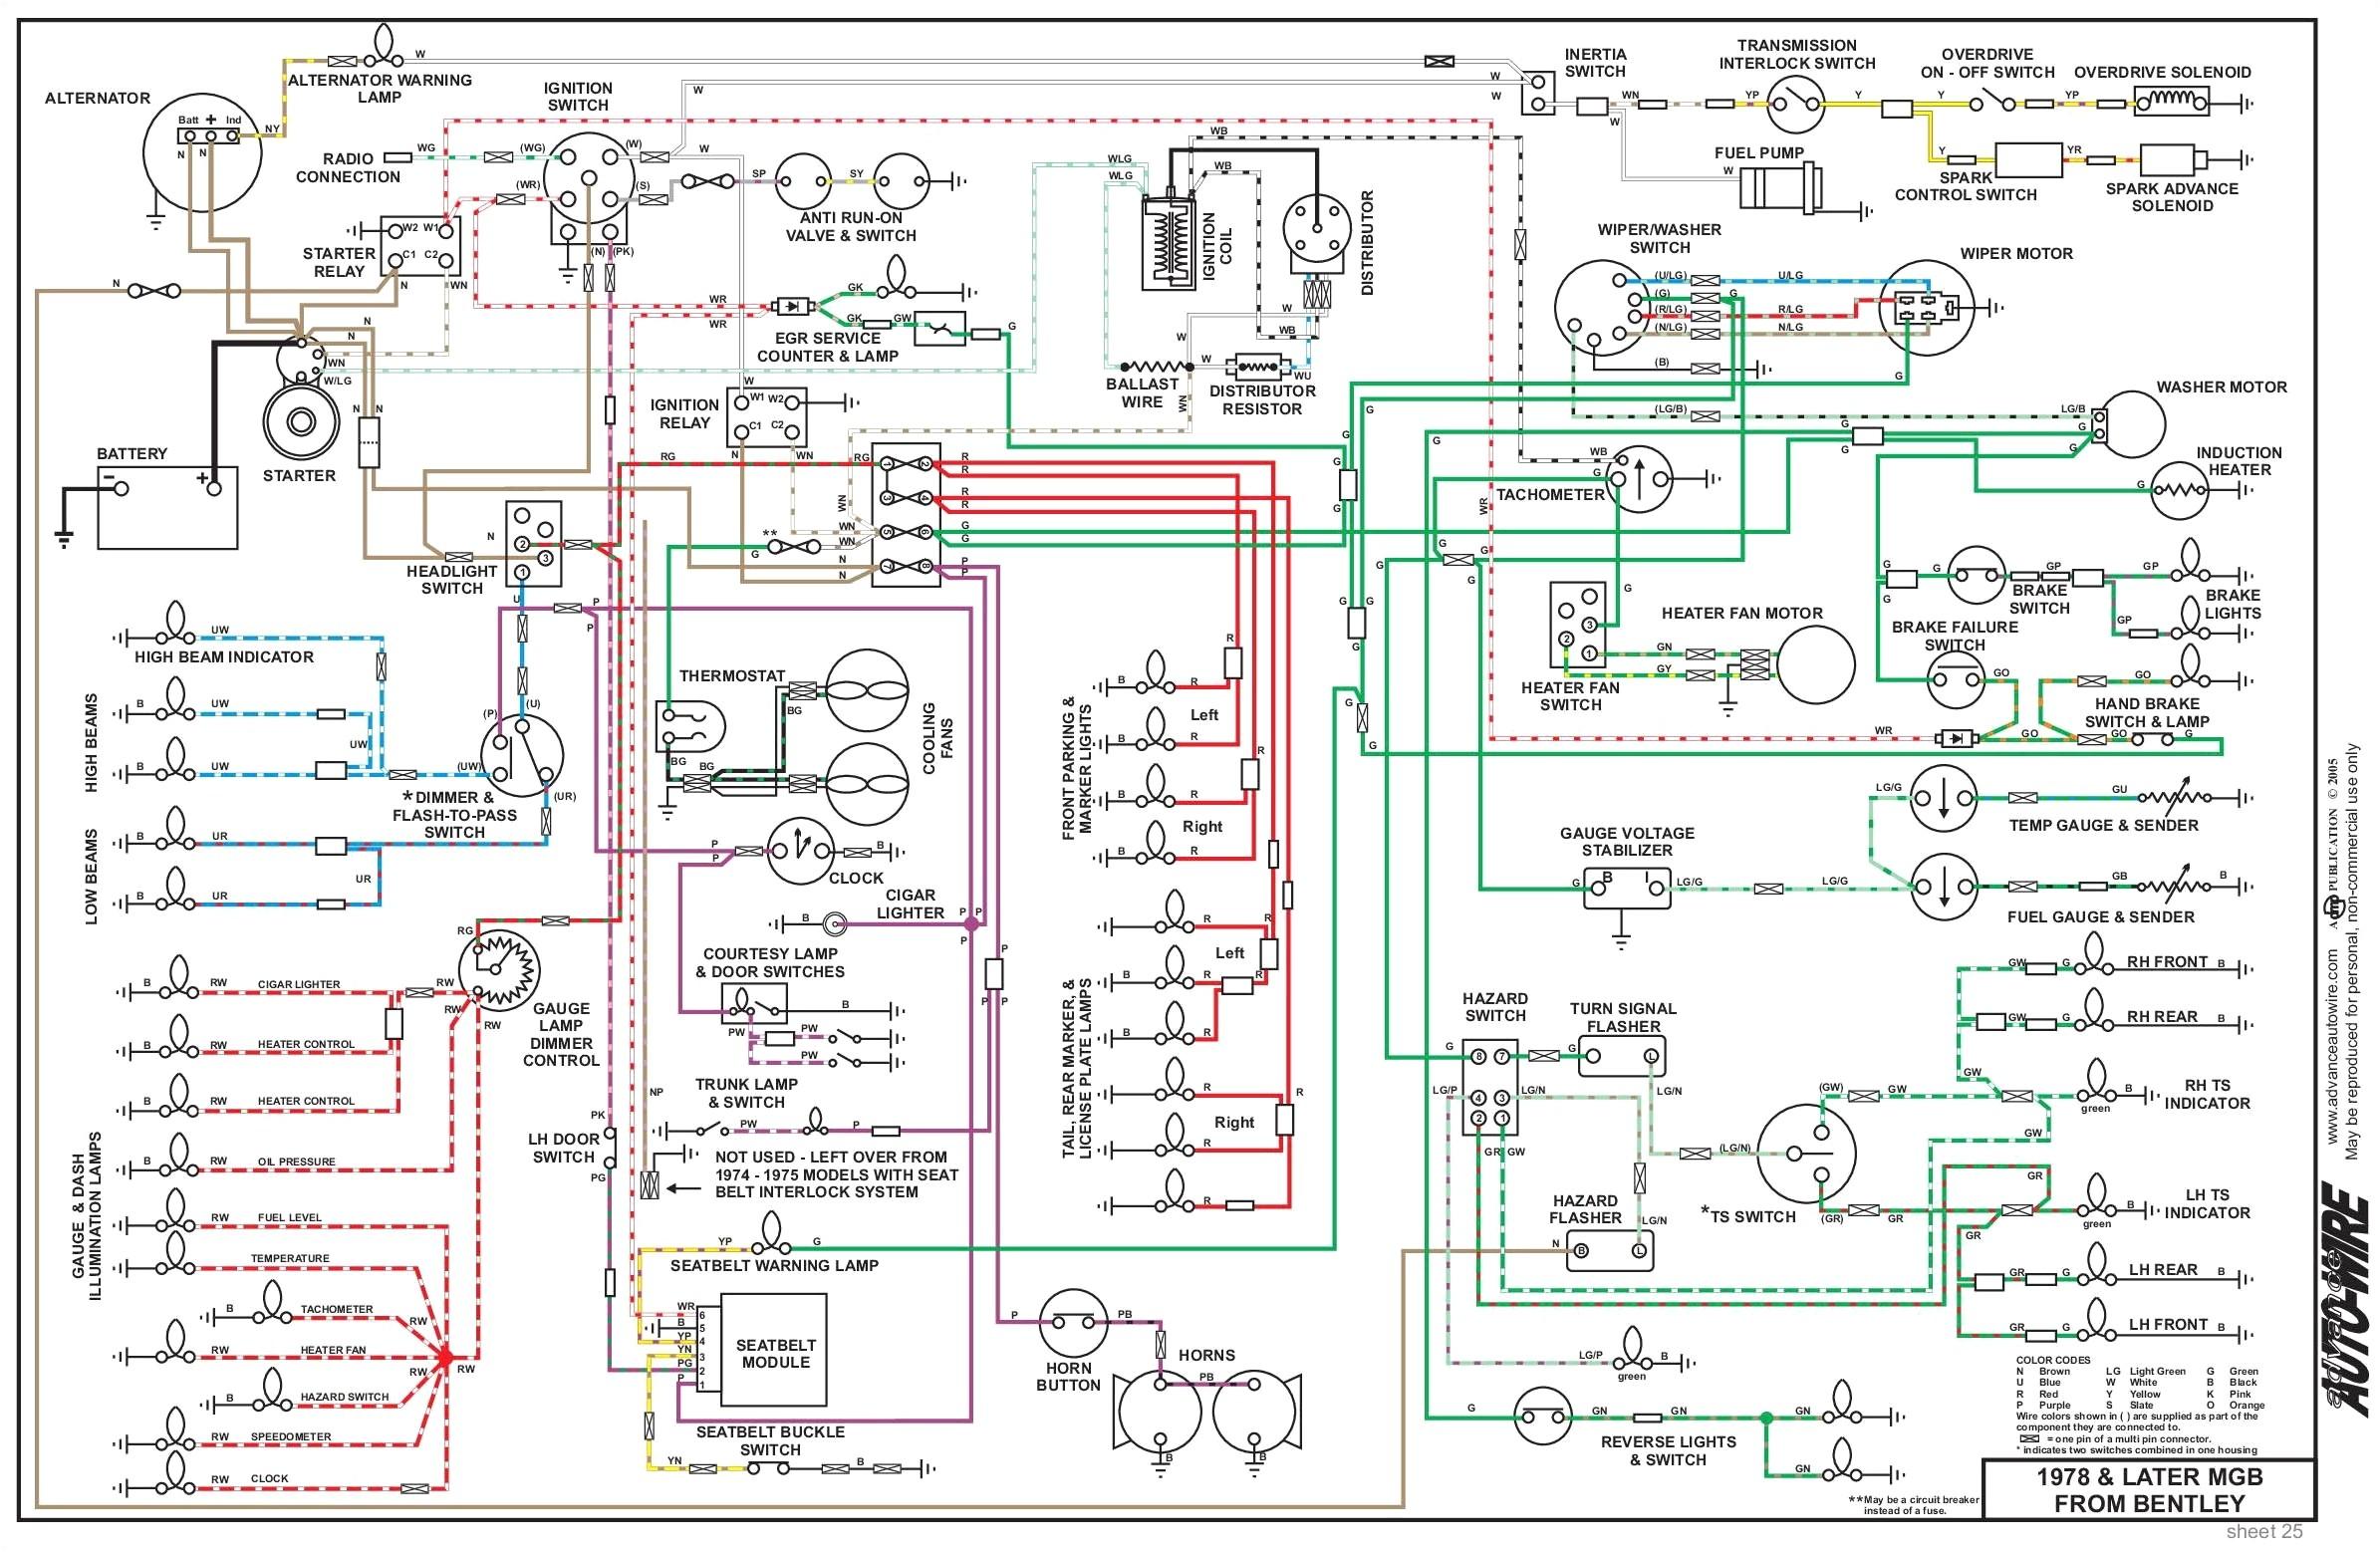 1977 mg mgb wiring diagram wiring diagram name 1973 mg mgb wiring diagram schematic wiring diagram